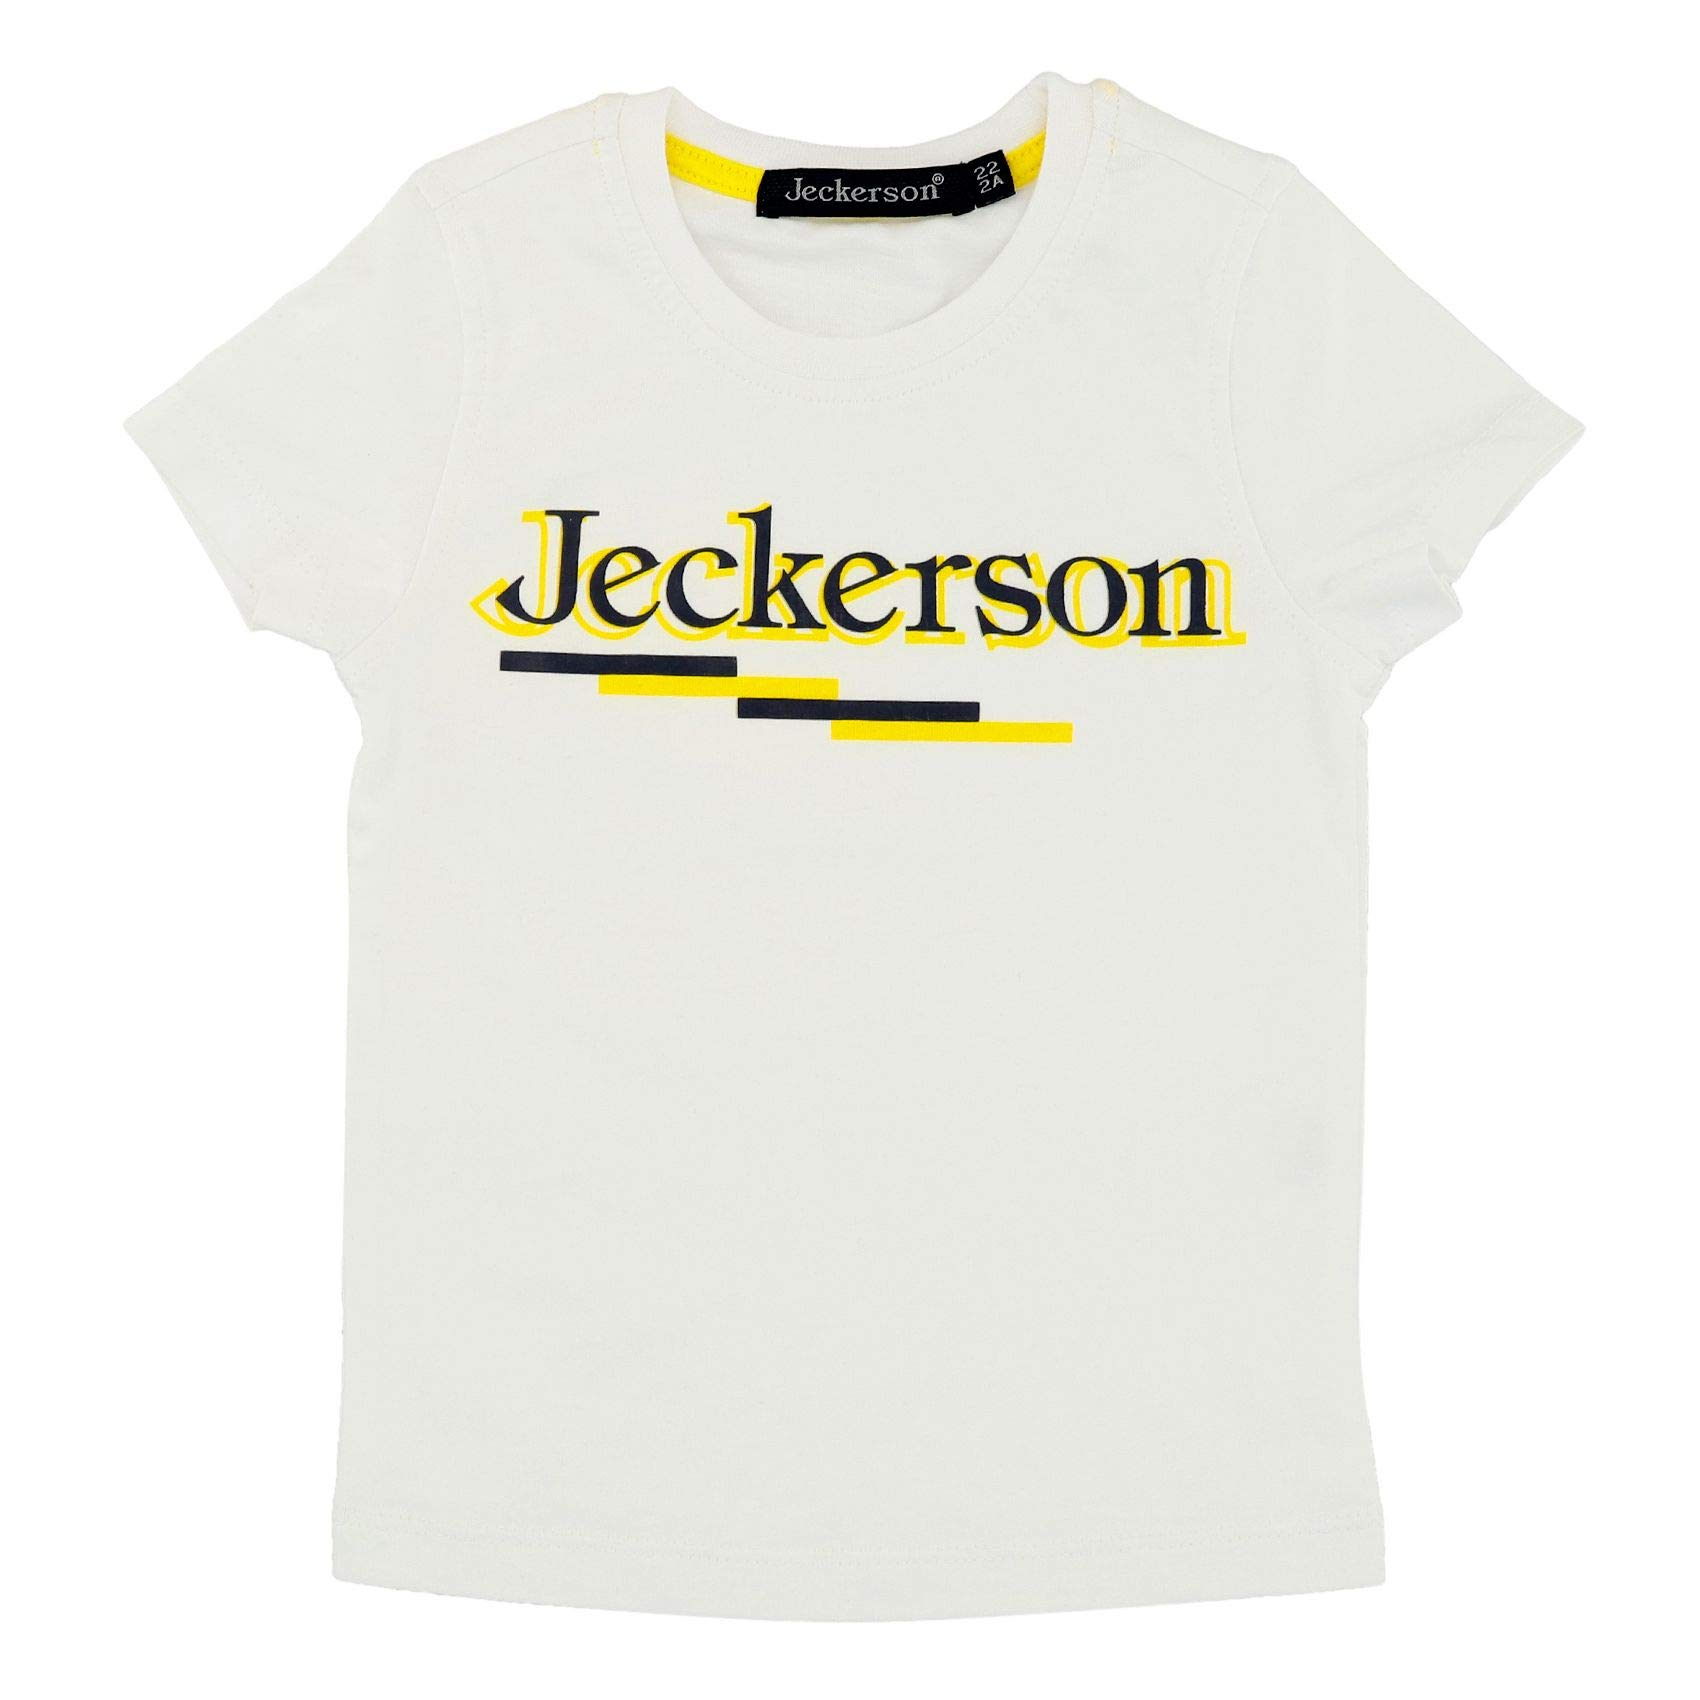 Jeckerson Boys Jb1044white White Viscose T-Shirt